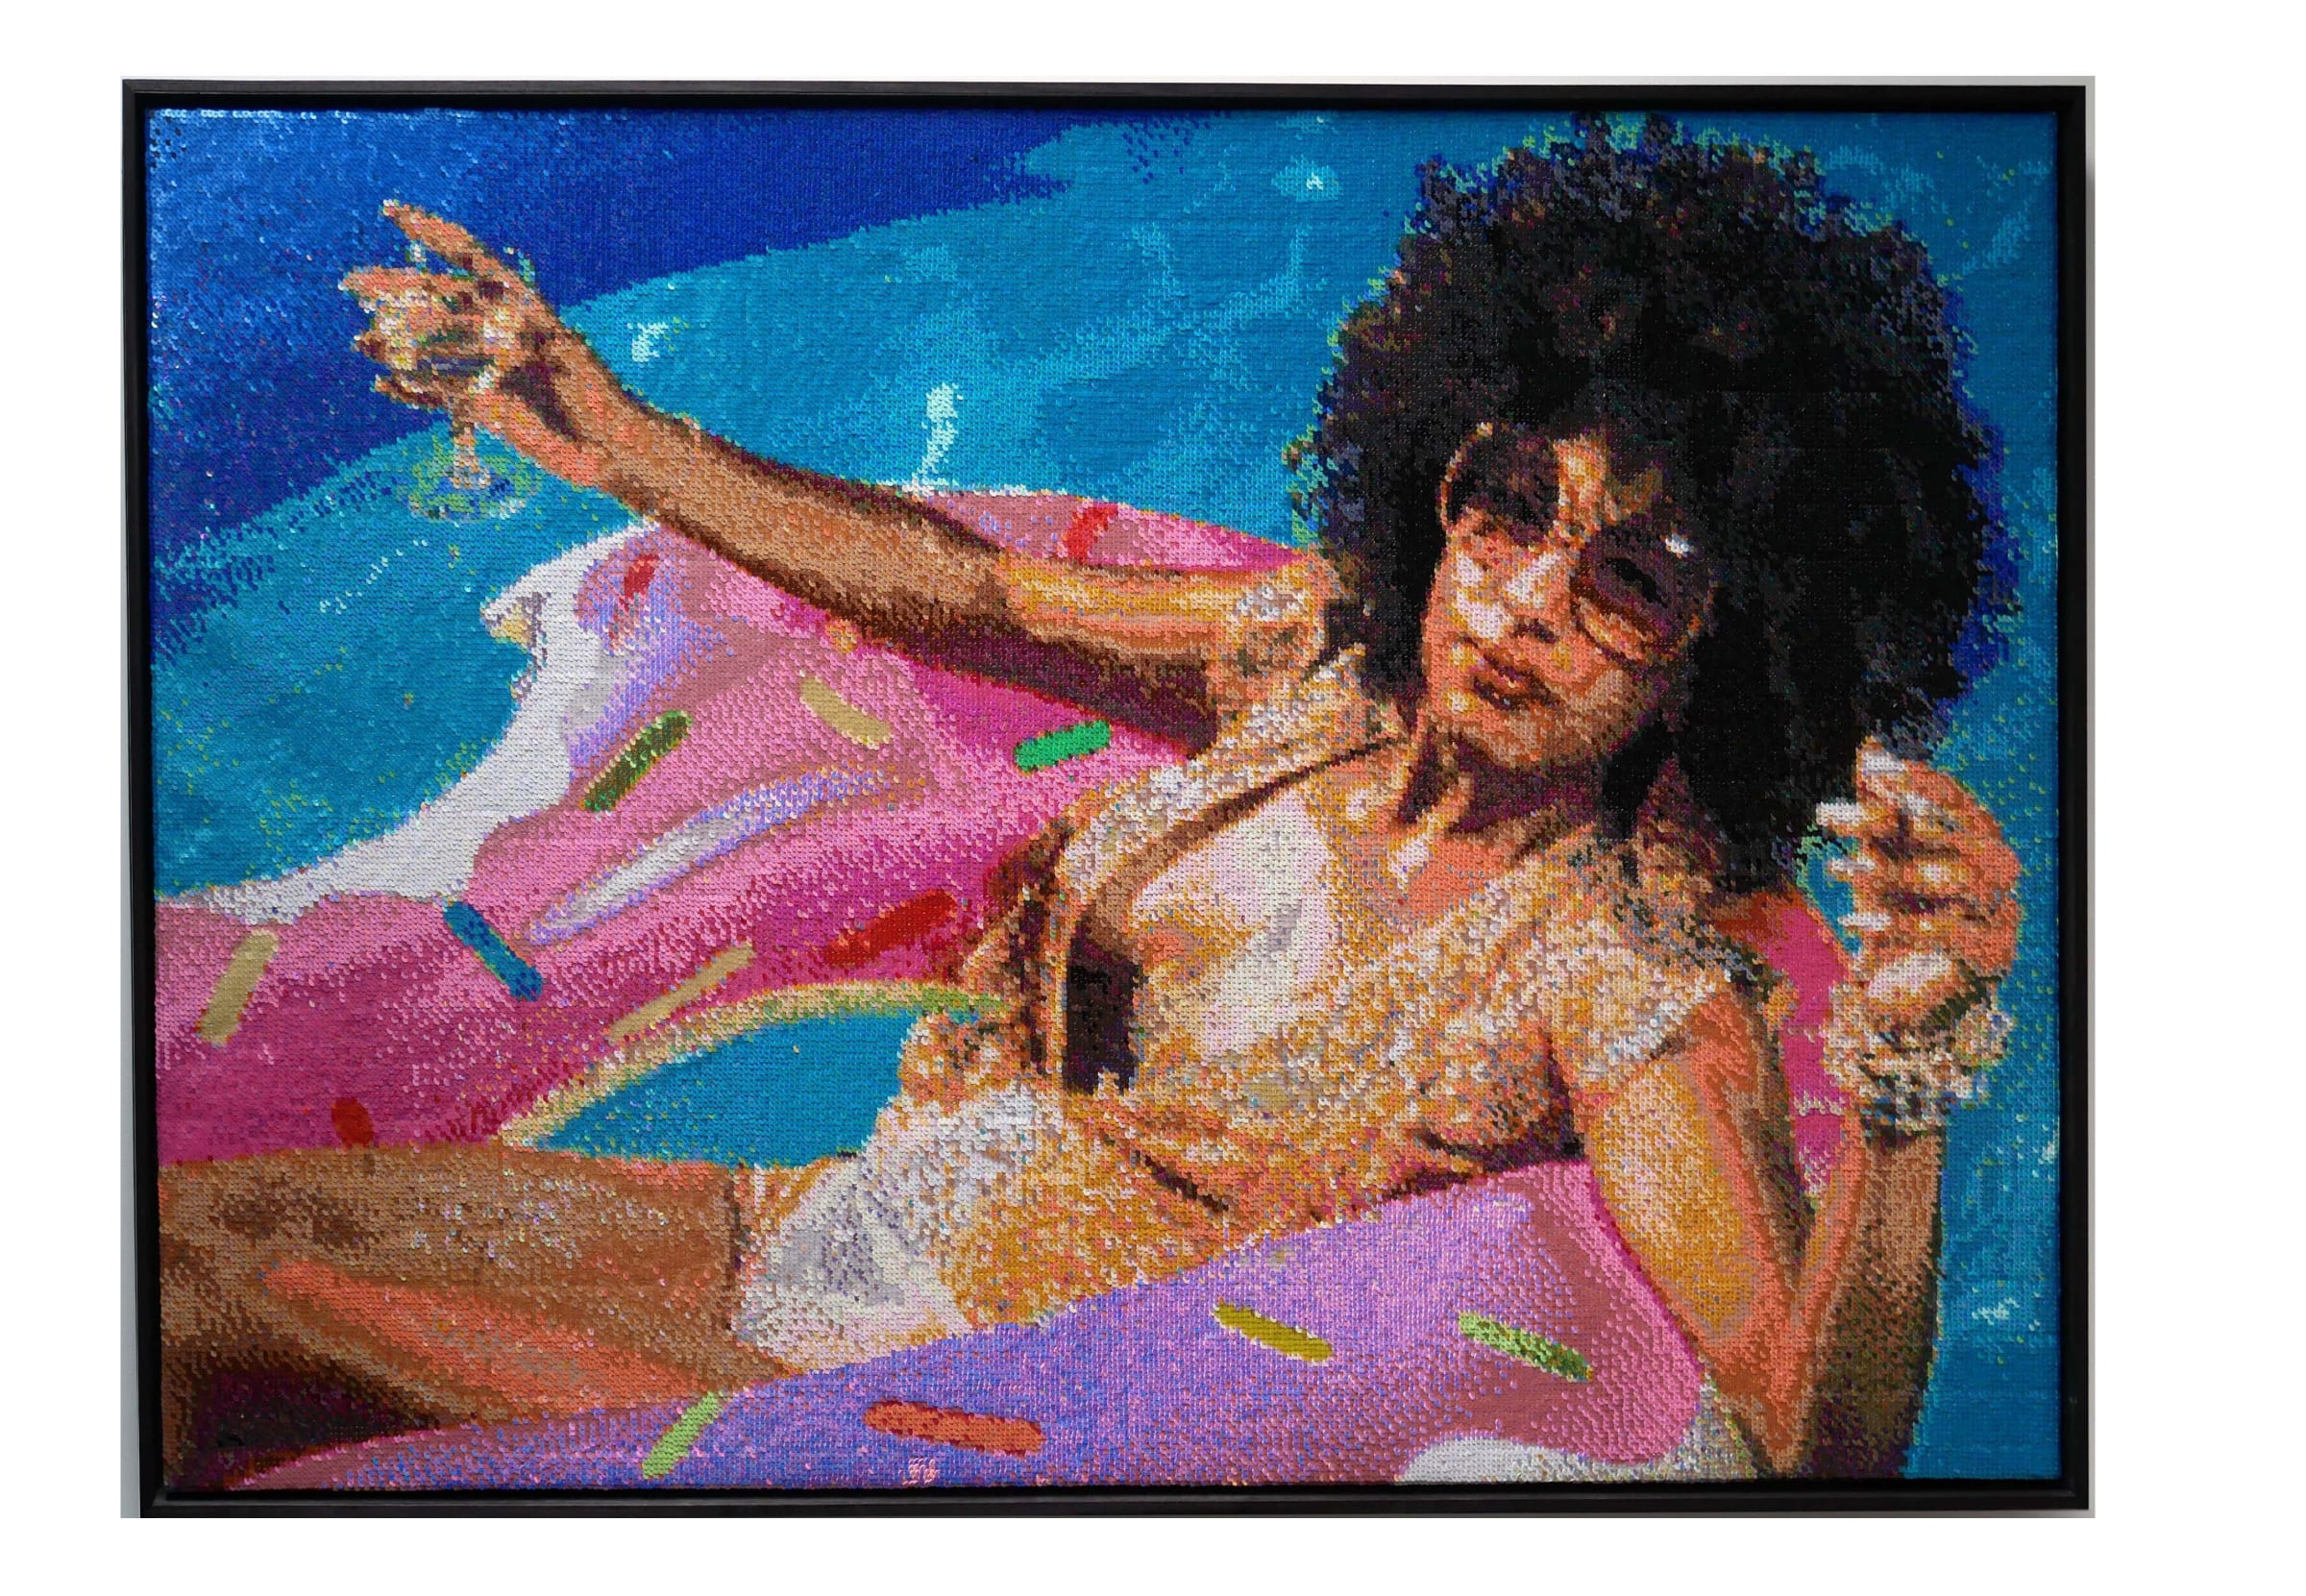 "<span class=""link fancybox-details-link""><a href=""/exhibitions/91/works/artworks10750/"">View Detail Page</a></span><div class=""artist""><strong>Frances GOODMAN</strong></div><div class=""title""><em>California Dreaming</em>, 2019</div><div class=""medium"">Handstitched sequins on canvas</div><div class=""dimensions"">106 x 158 x 7 cm<br>41 3/4 x 62 1/4 x 2 3/4 in</div>"